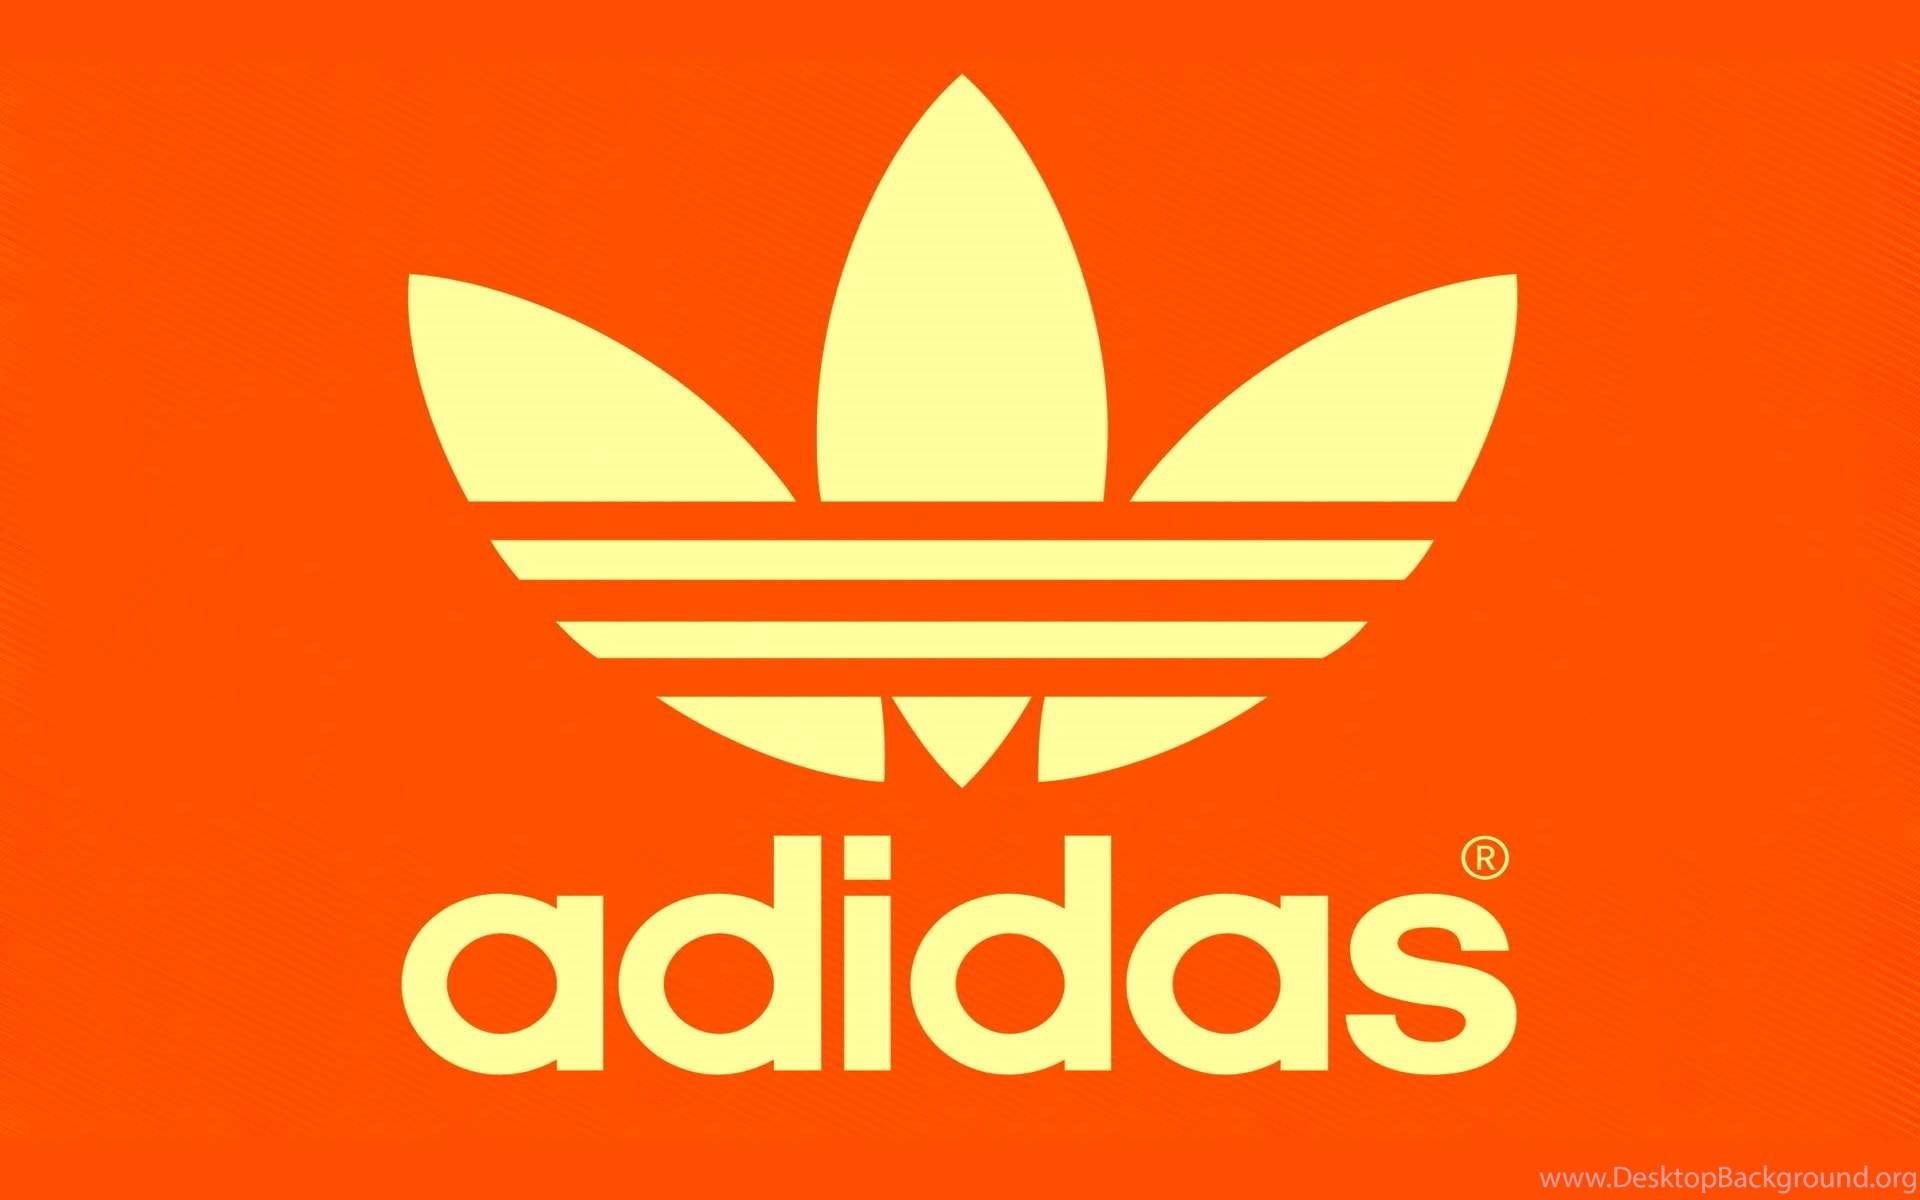 Adidas Originals Wallpapers Full Hd Wallpapers Search Desktop